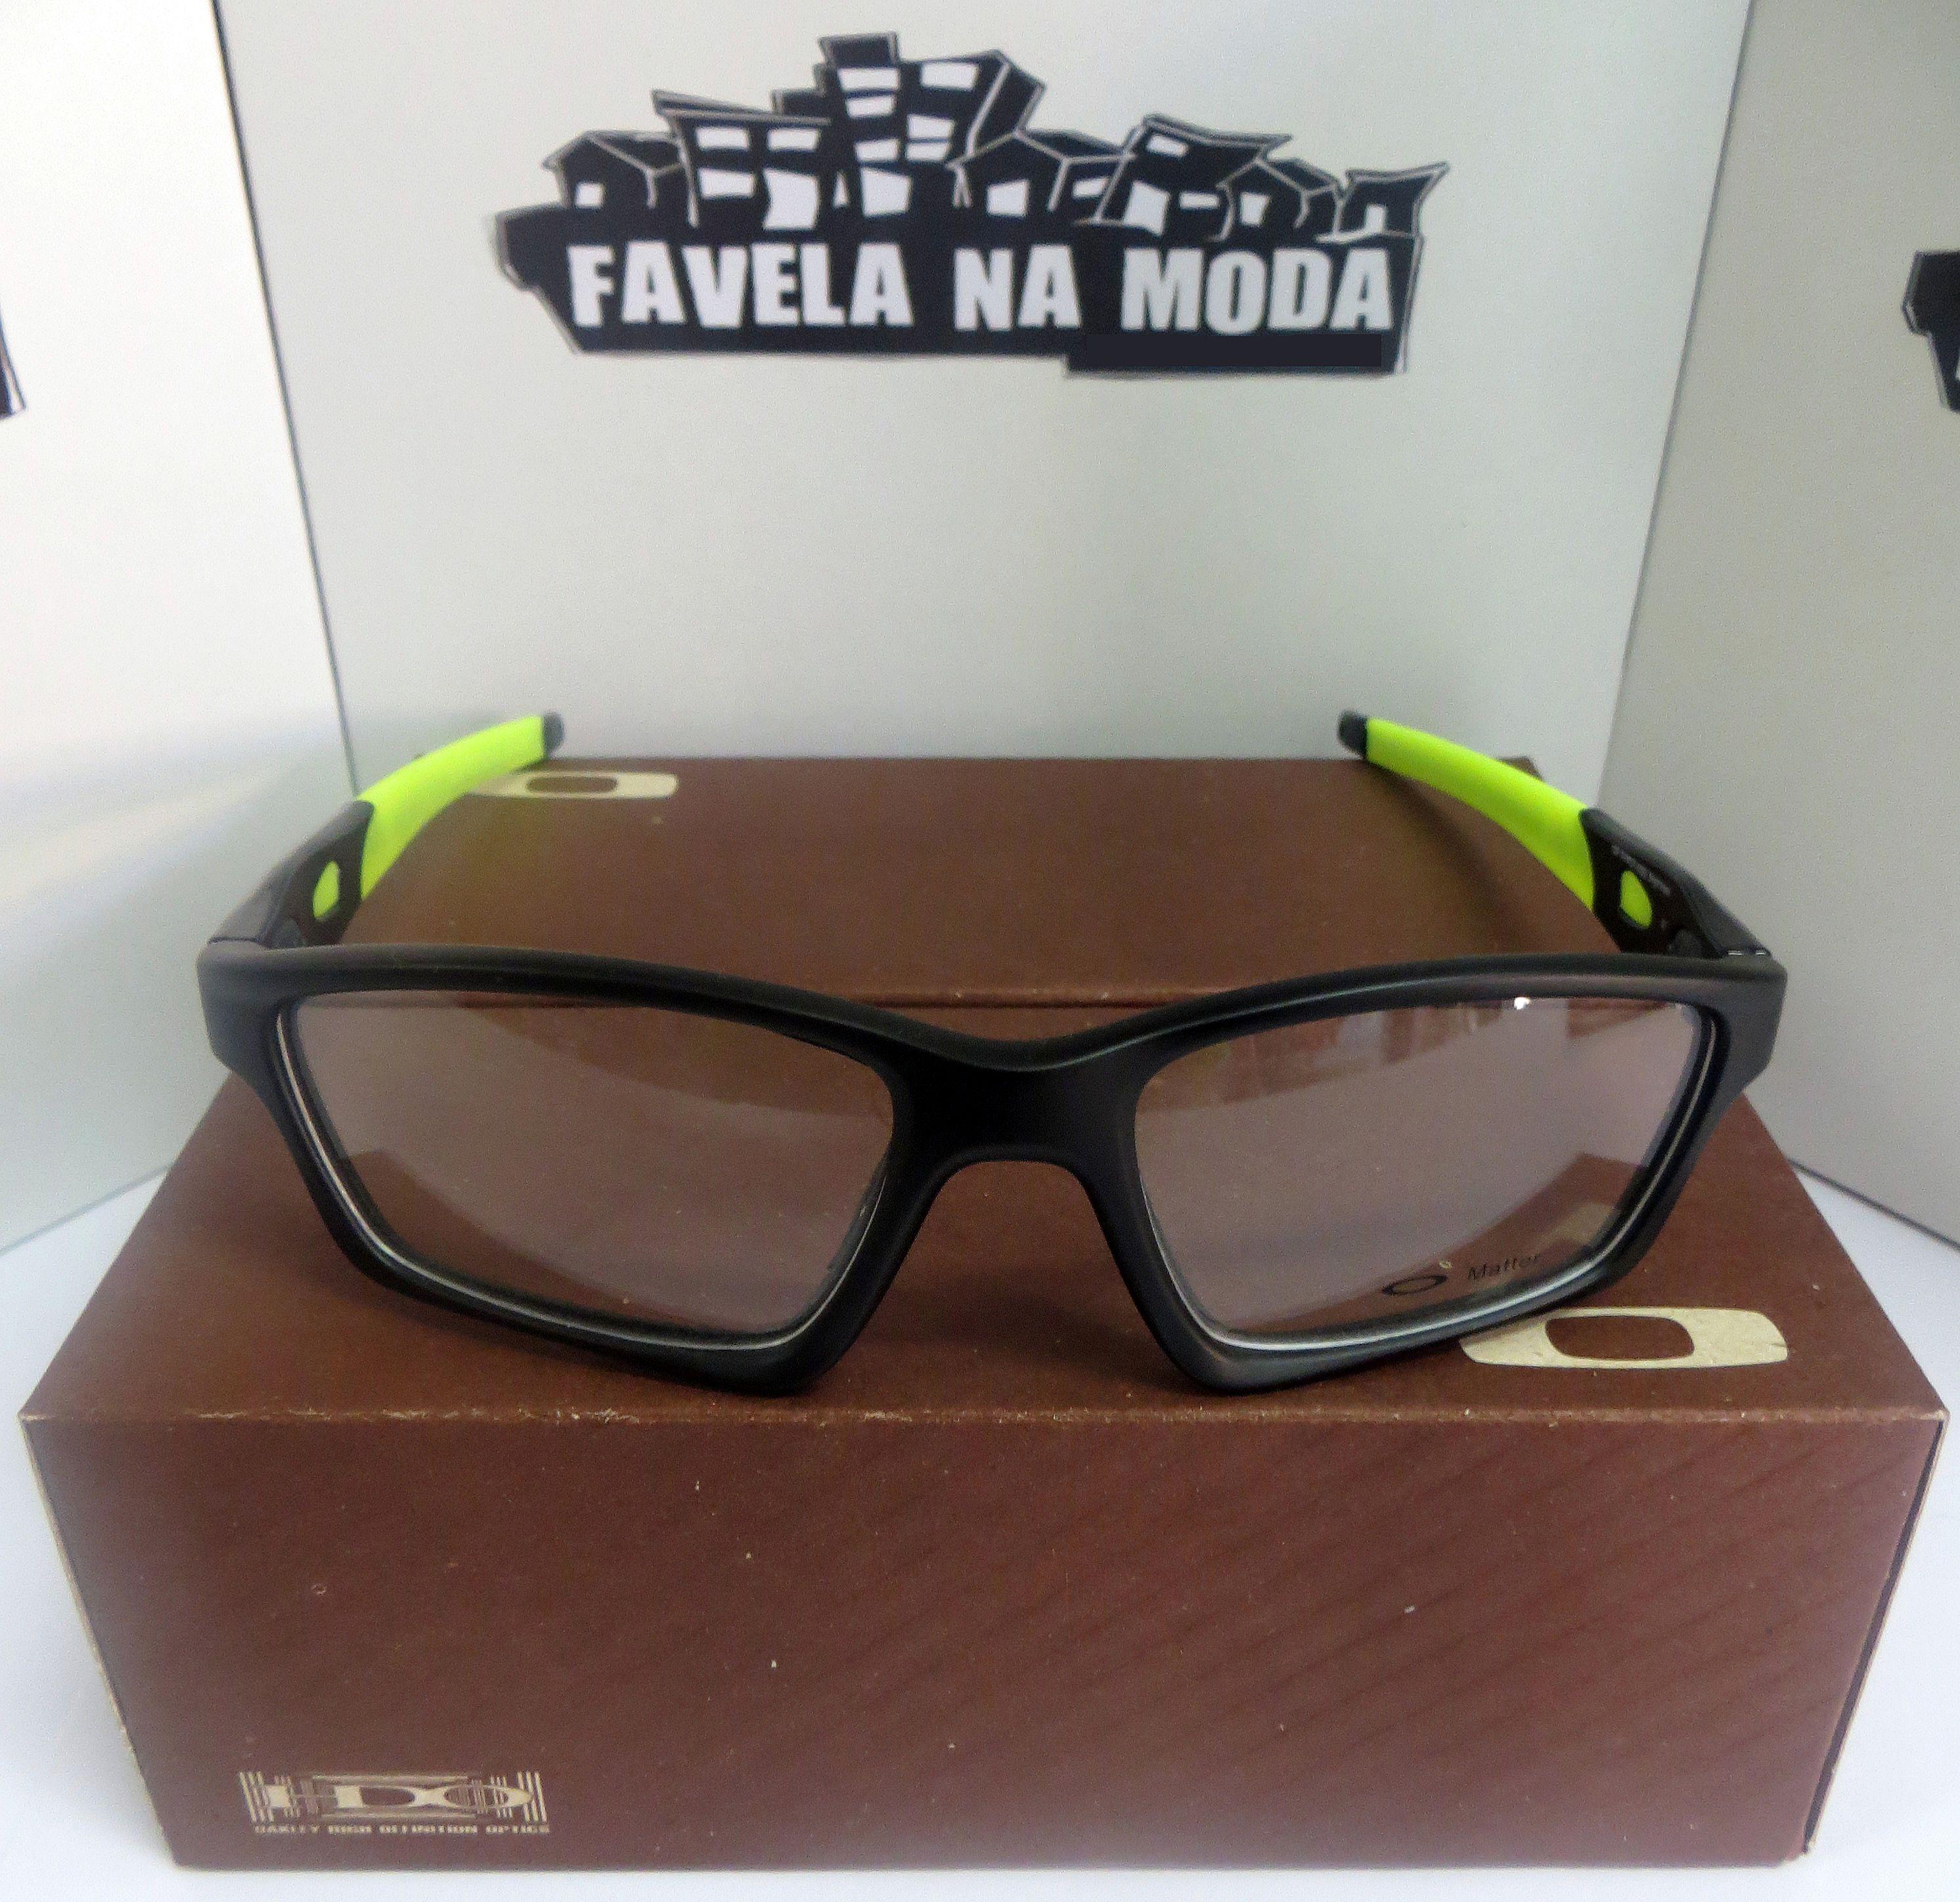 8ed60088a Óculos - Óculos Oakley - Crosslink - Favela na Moda Imports